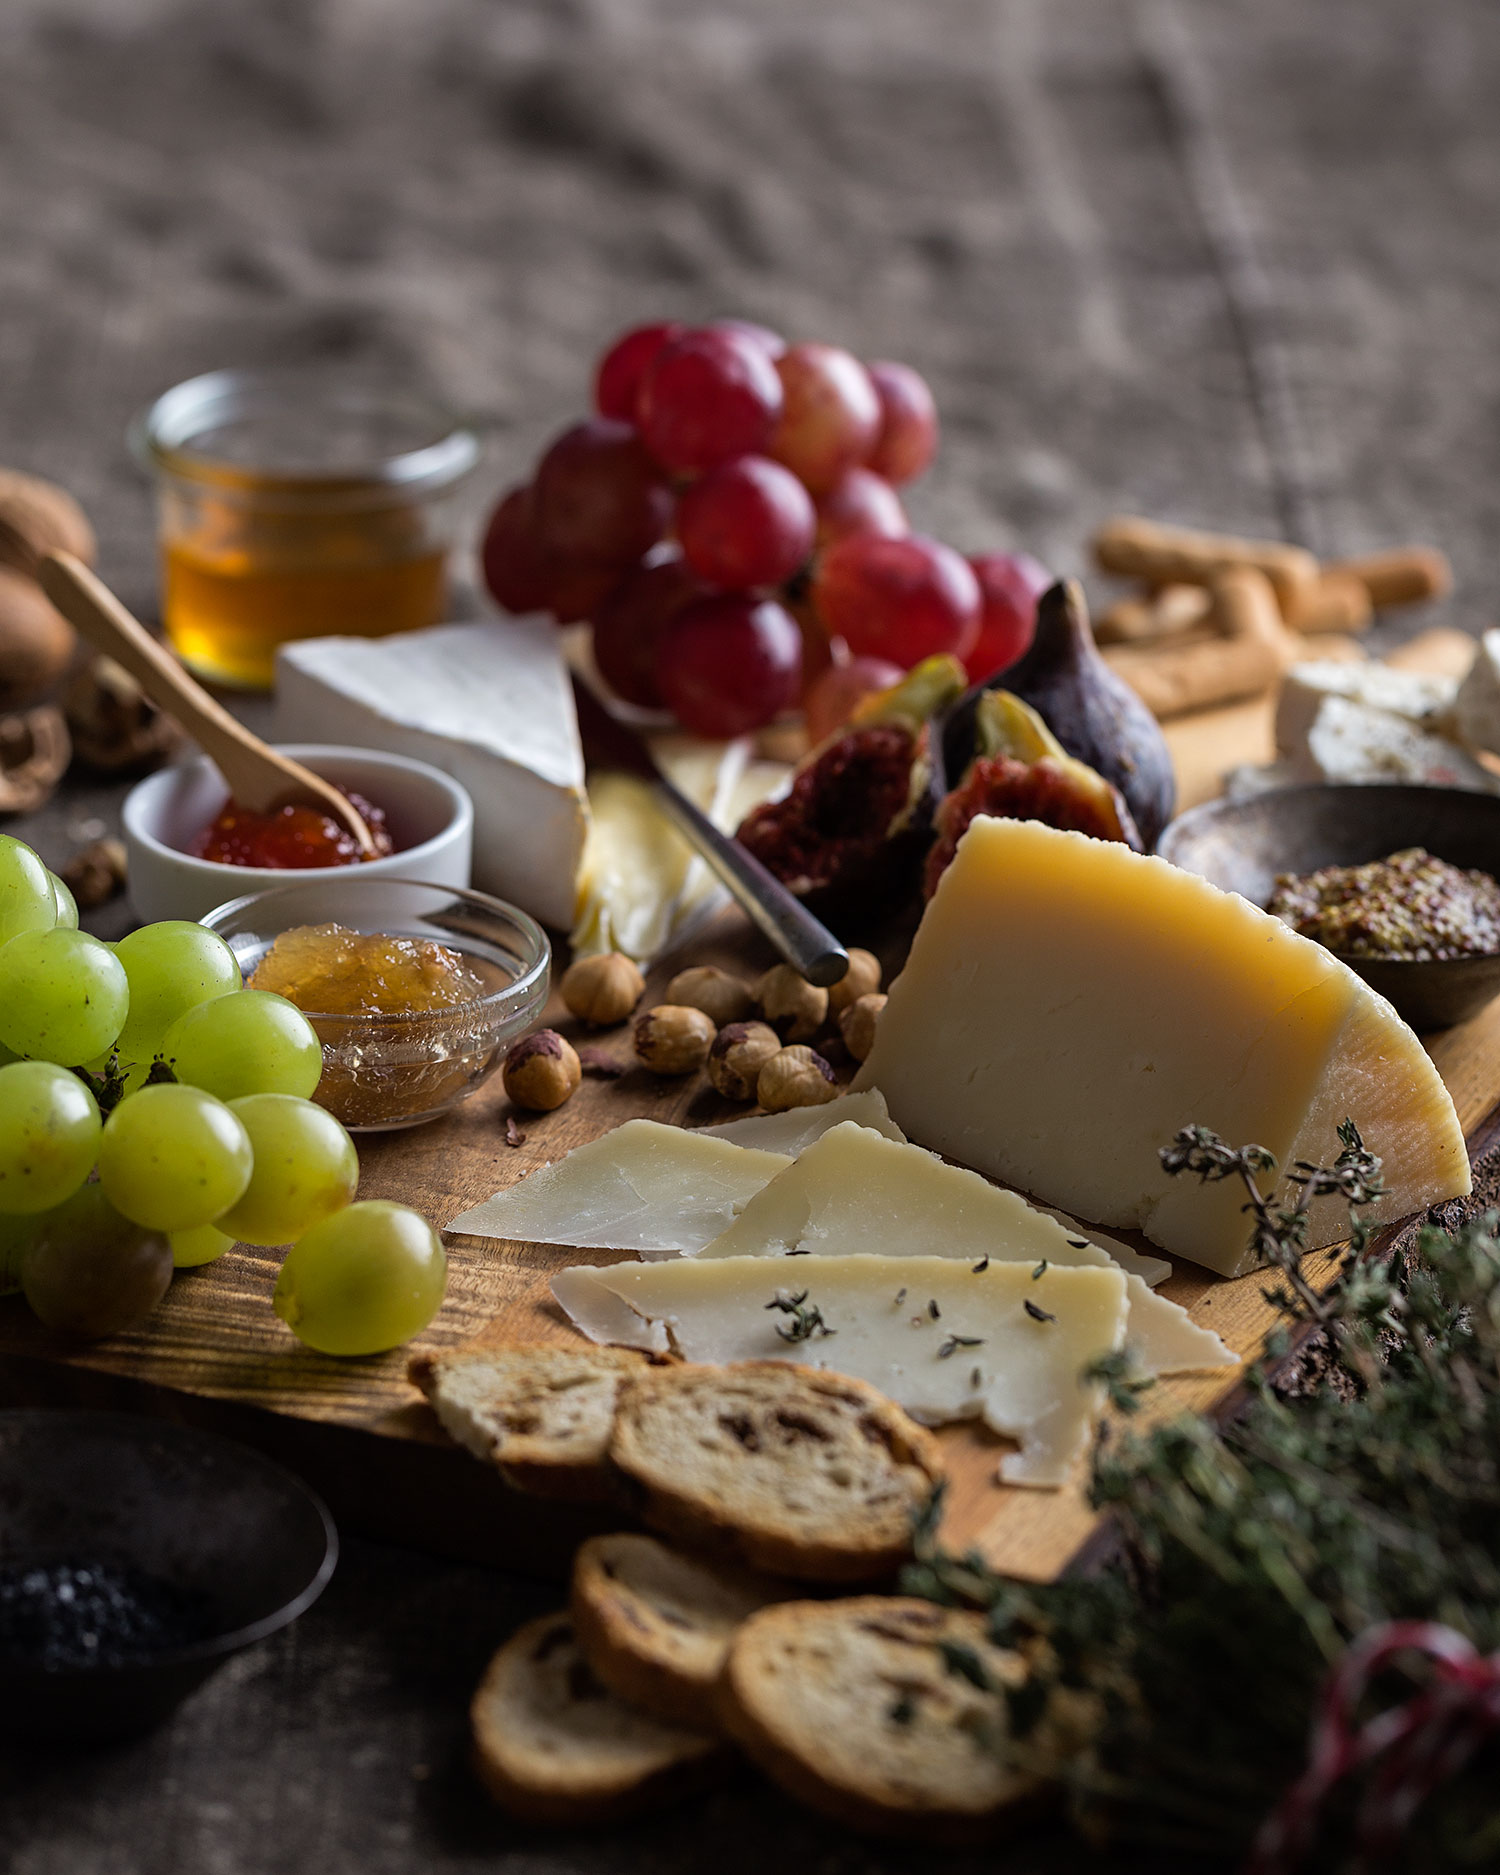 corina-landa-food-photography-fotografia-gastronomica-59.jpg